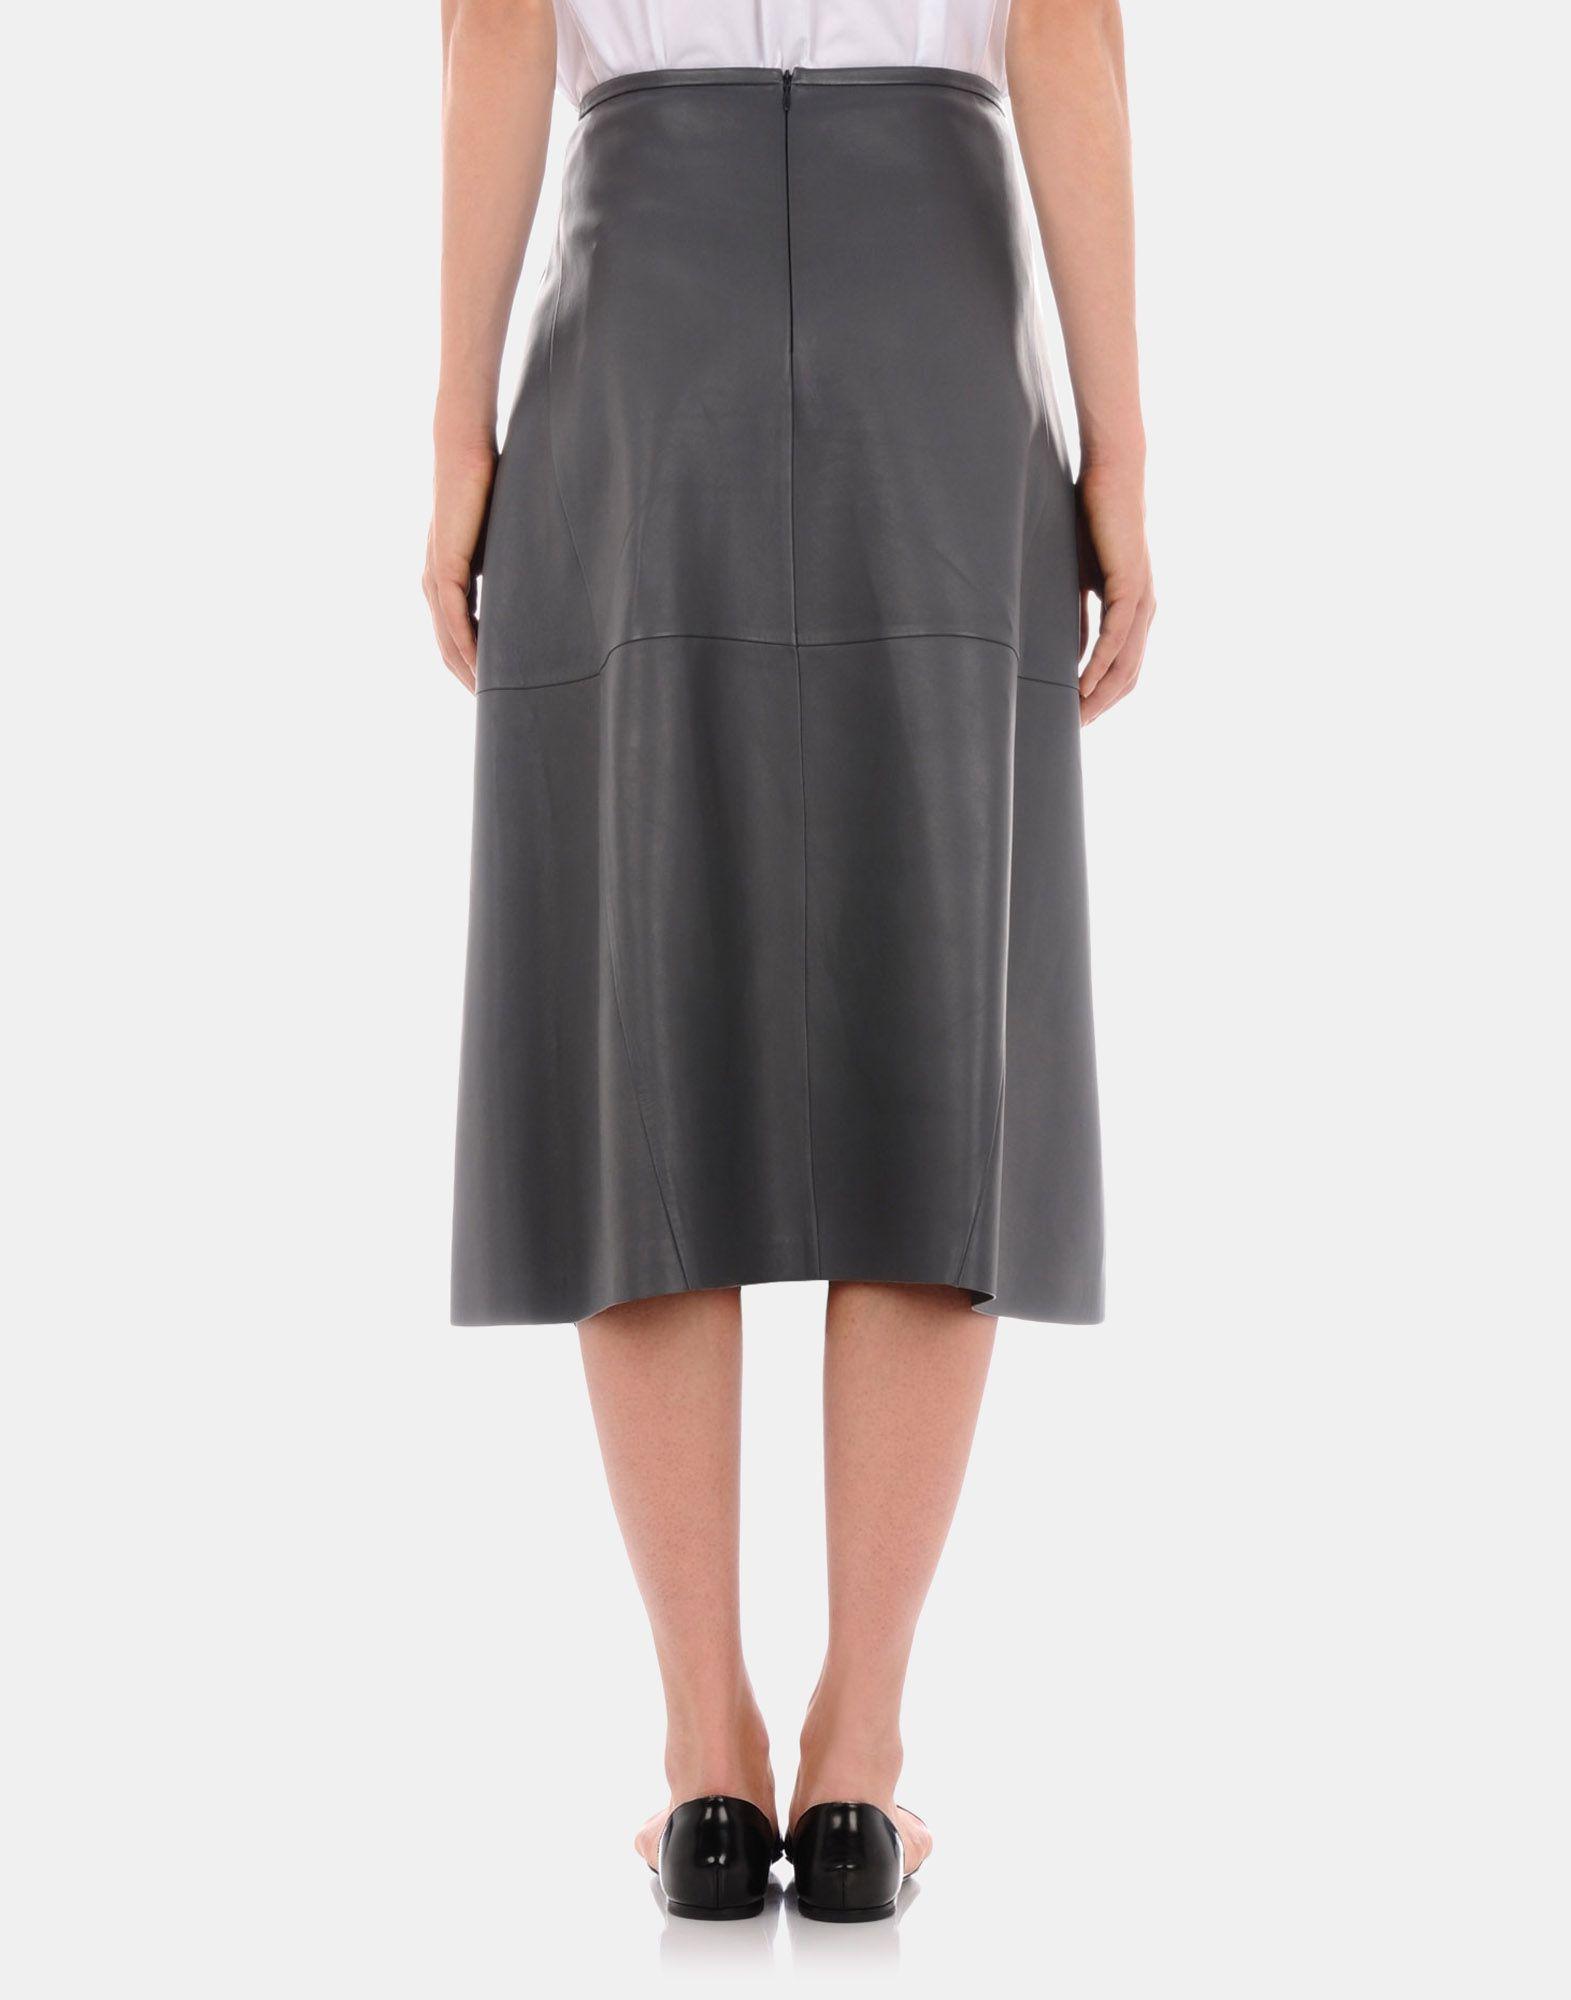 31a6dce92726 Leather skirt Women - Skirts Women on Jil Sander Online Store